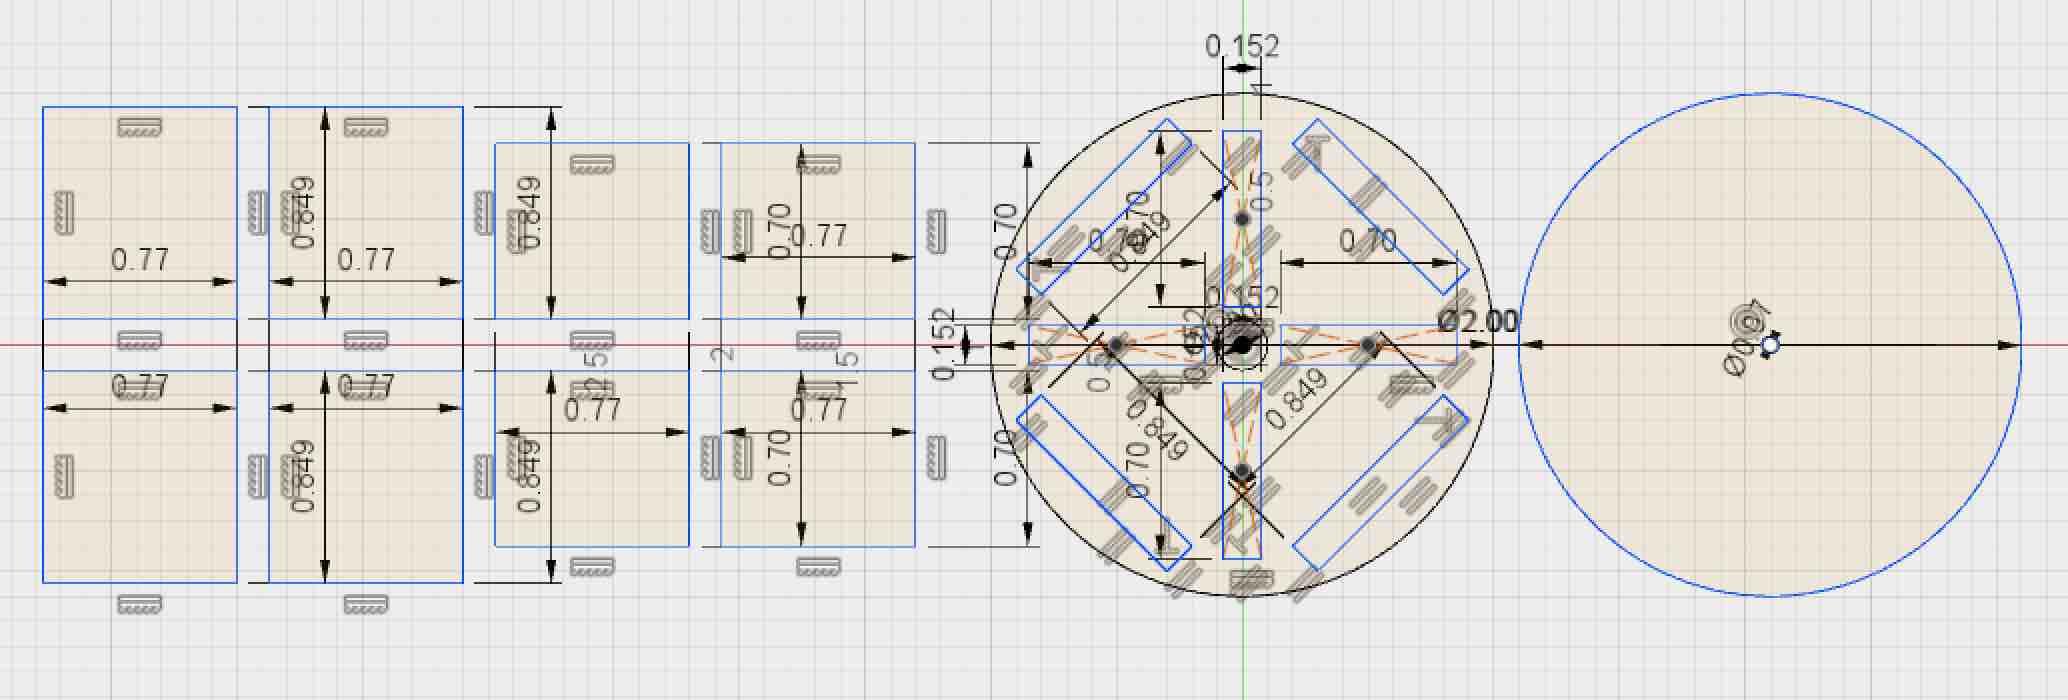 Light Sensor 300dpi Png Eagle Schematic Board Schematic Image